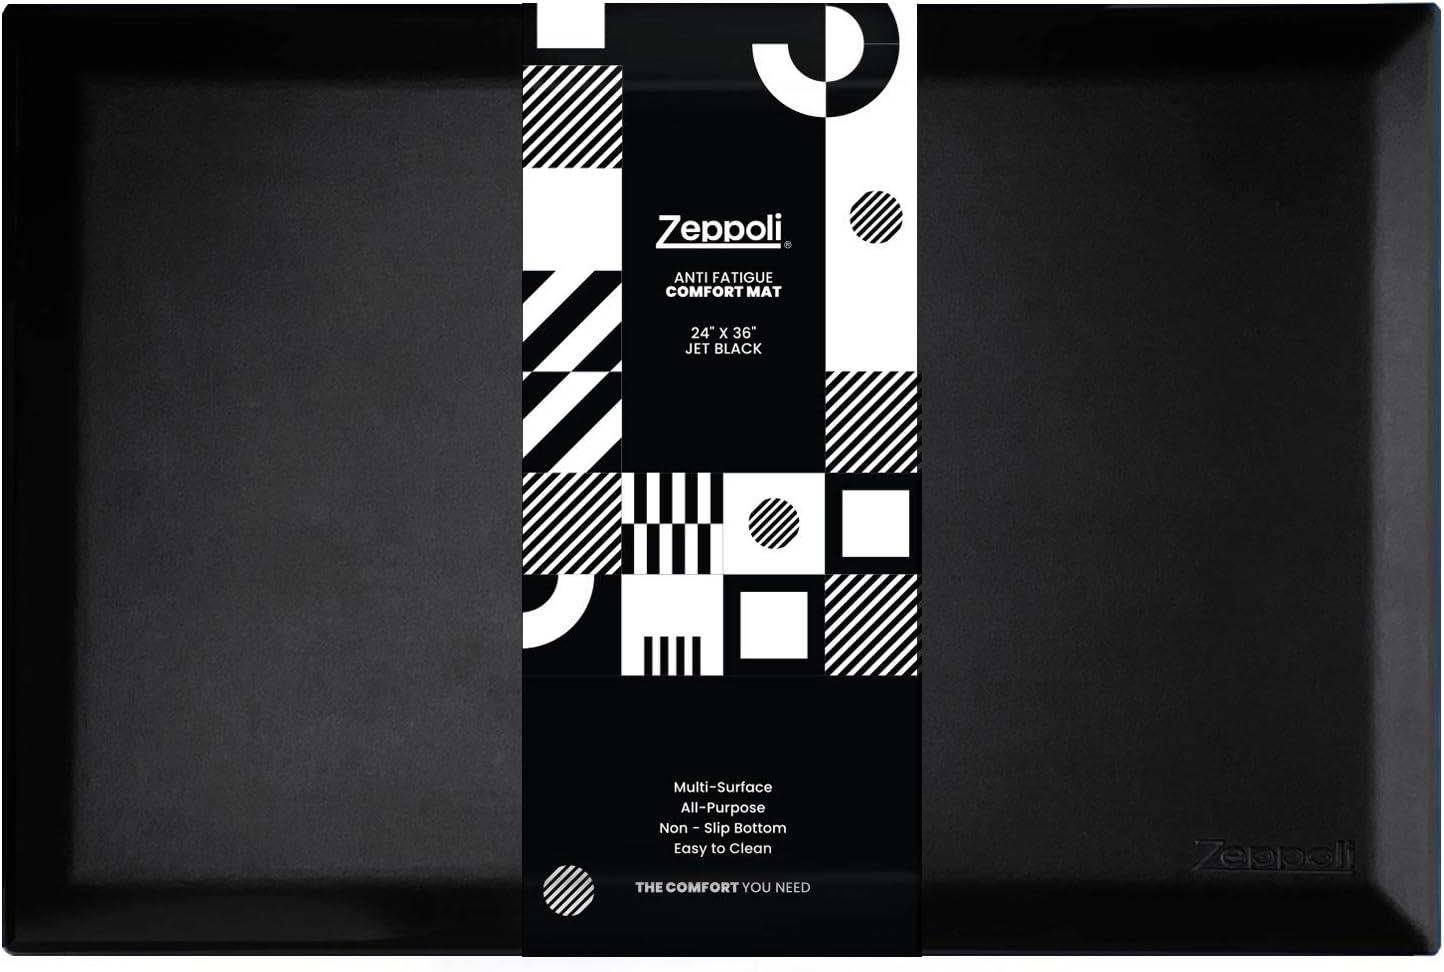 Royal Anti Fatigue Comfort Award Floor by Spasm price Mat Zeppoli - Kitchen